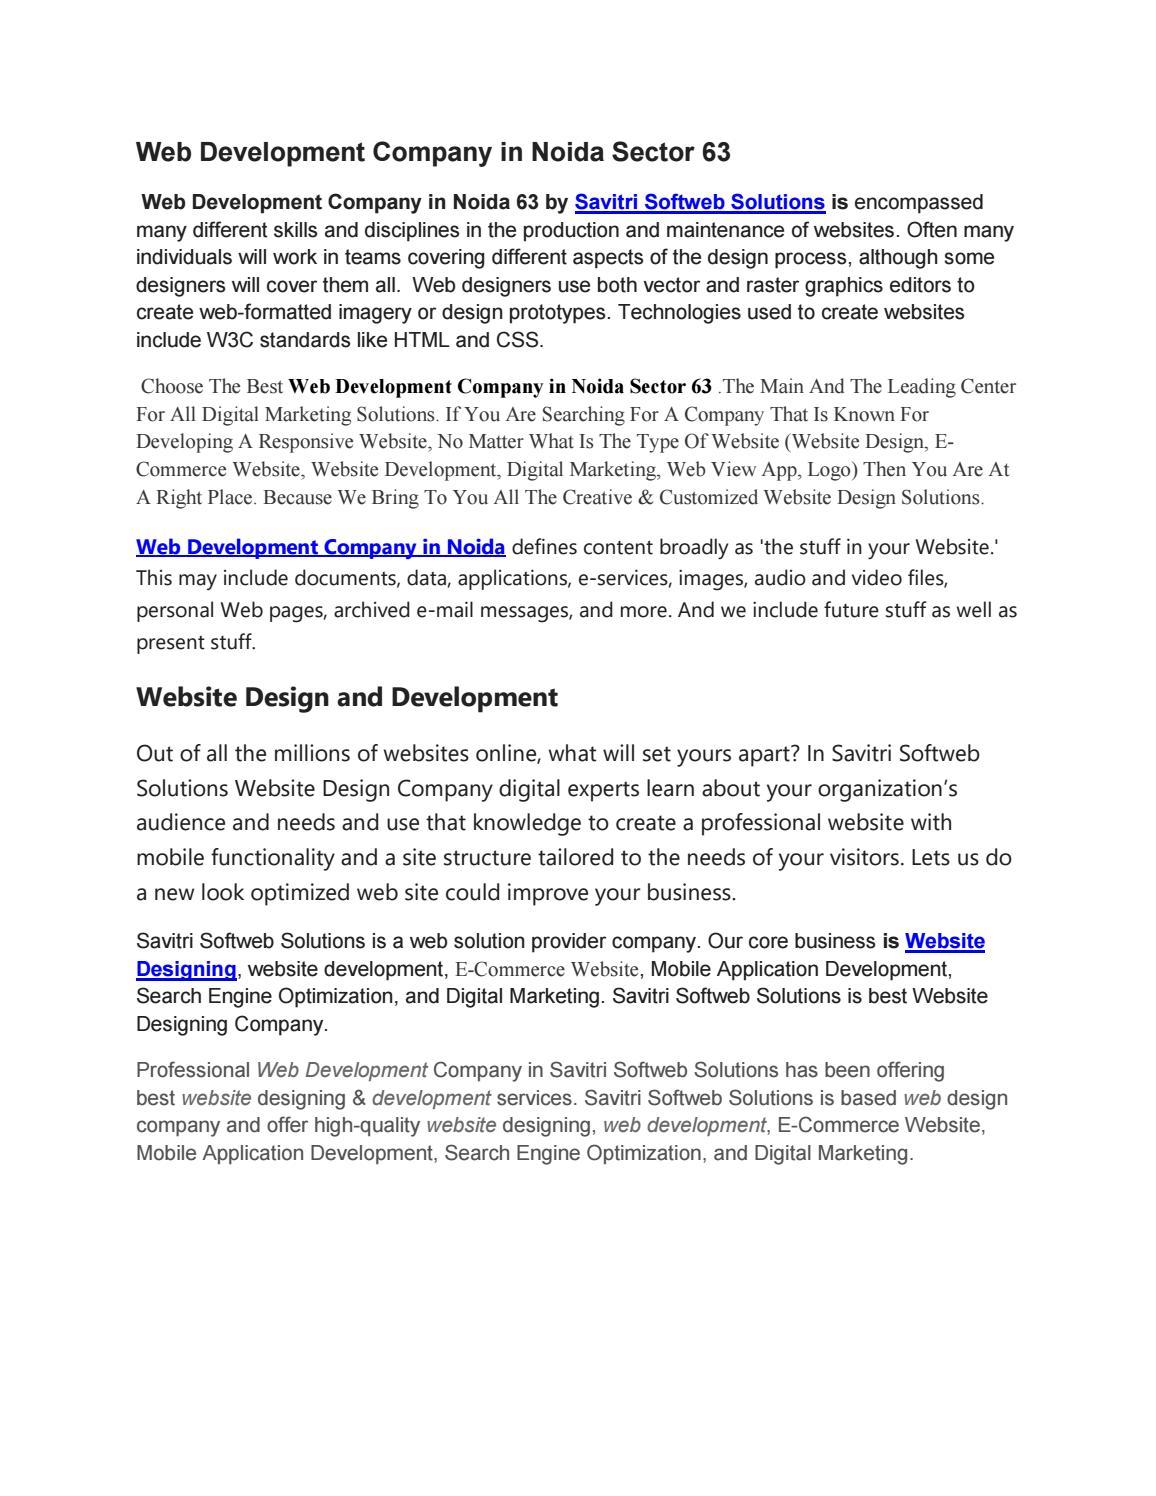 Web Development Company in Noida Sector 63 | Web development